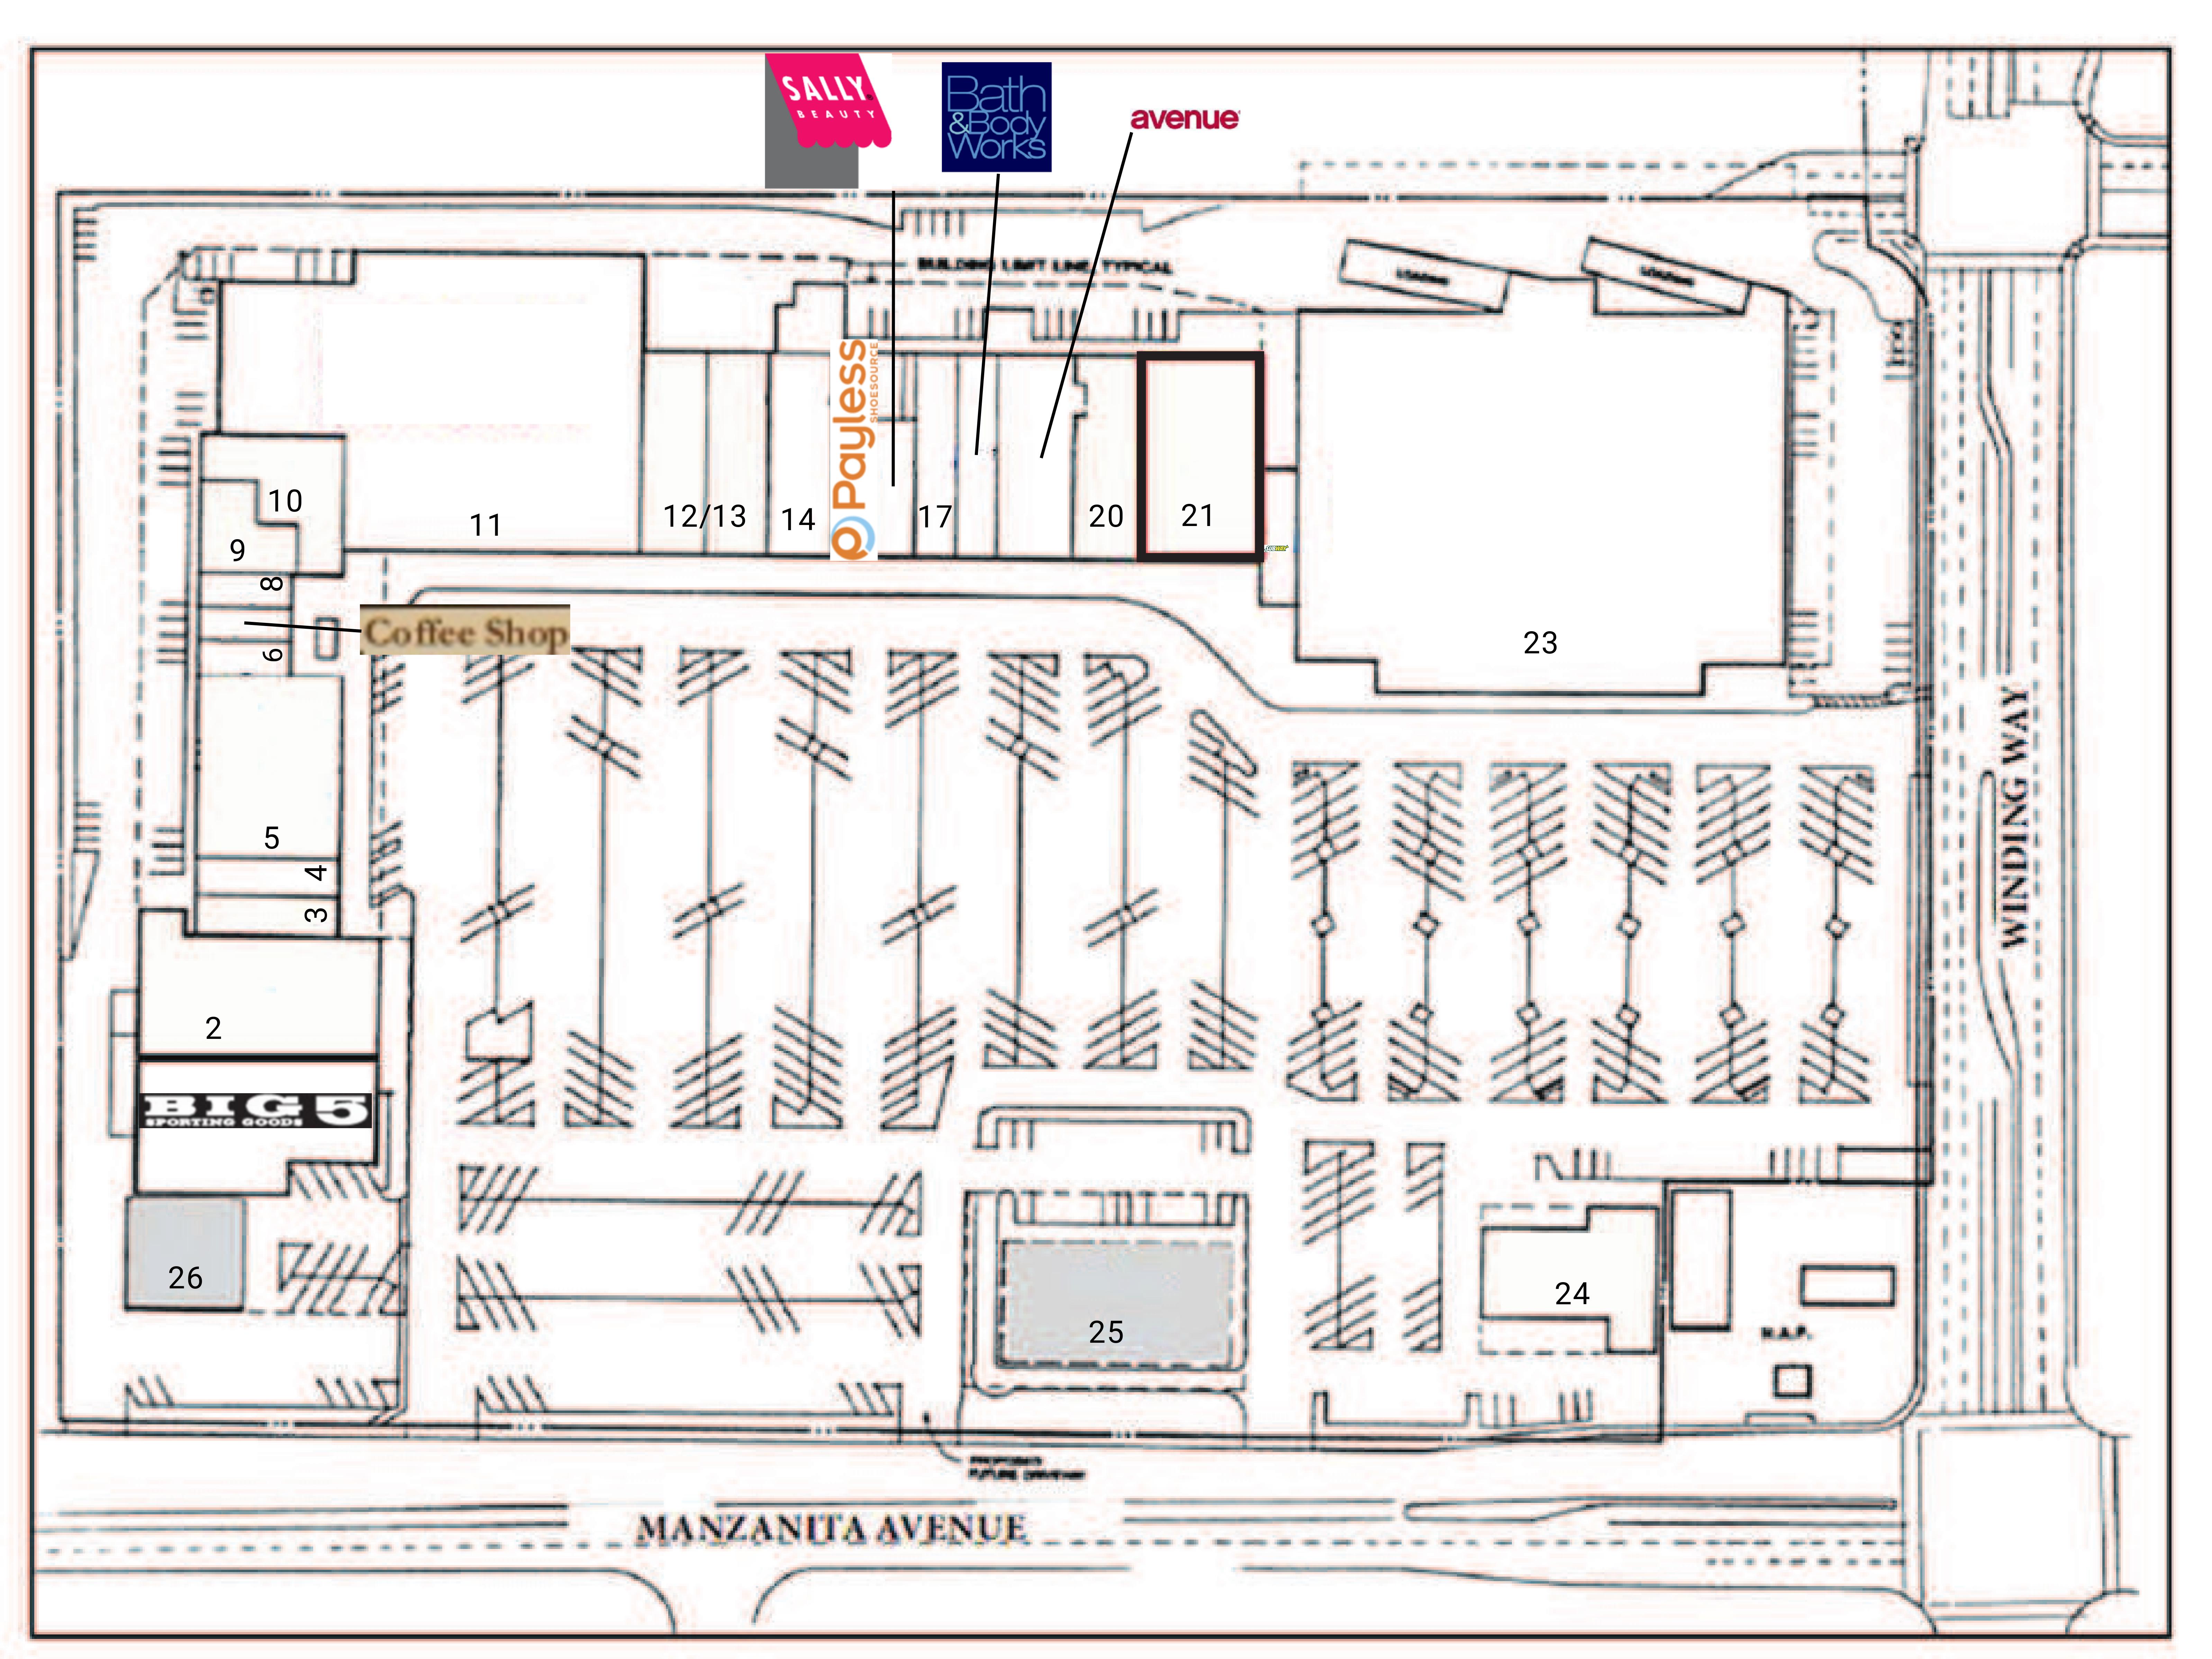 Crestview Shopping Center: site plan